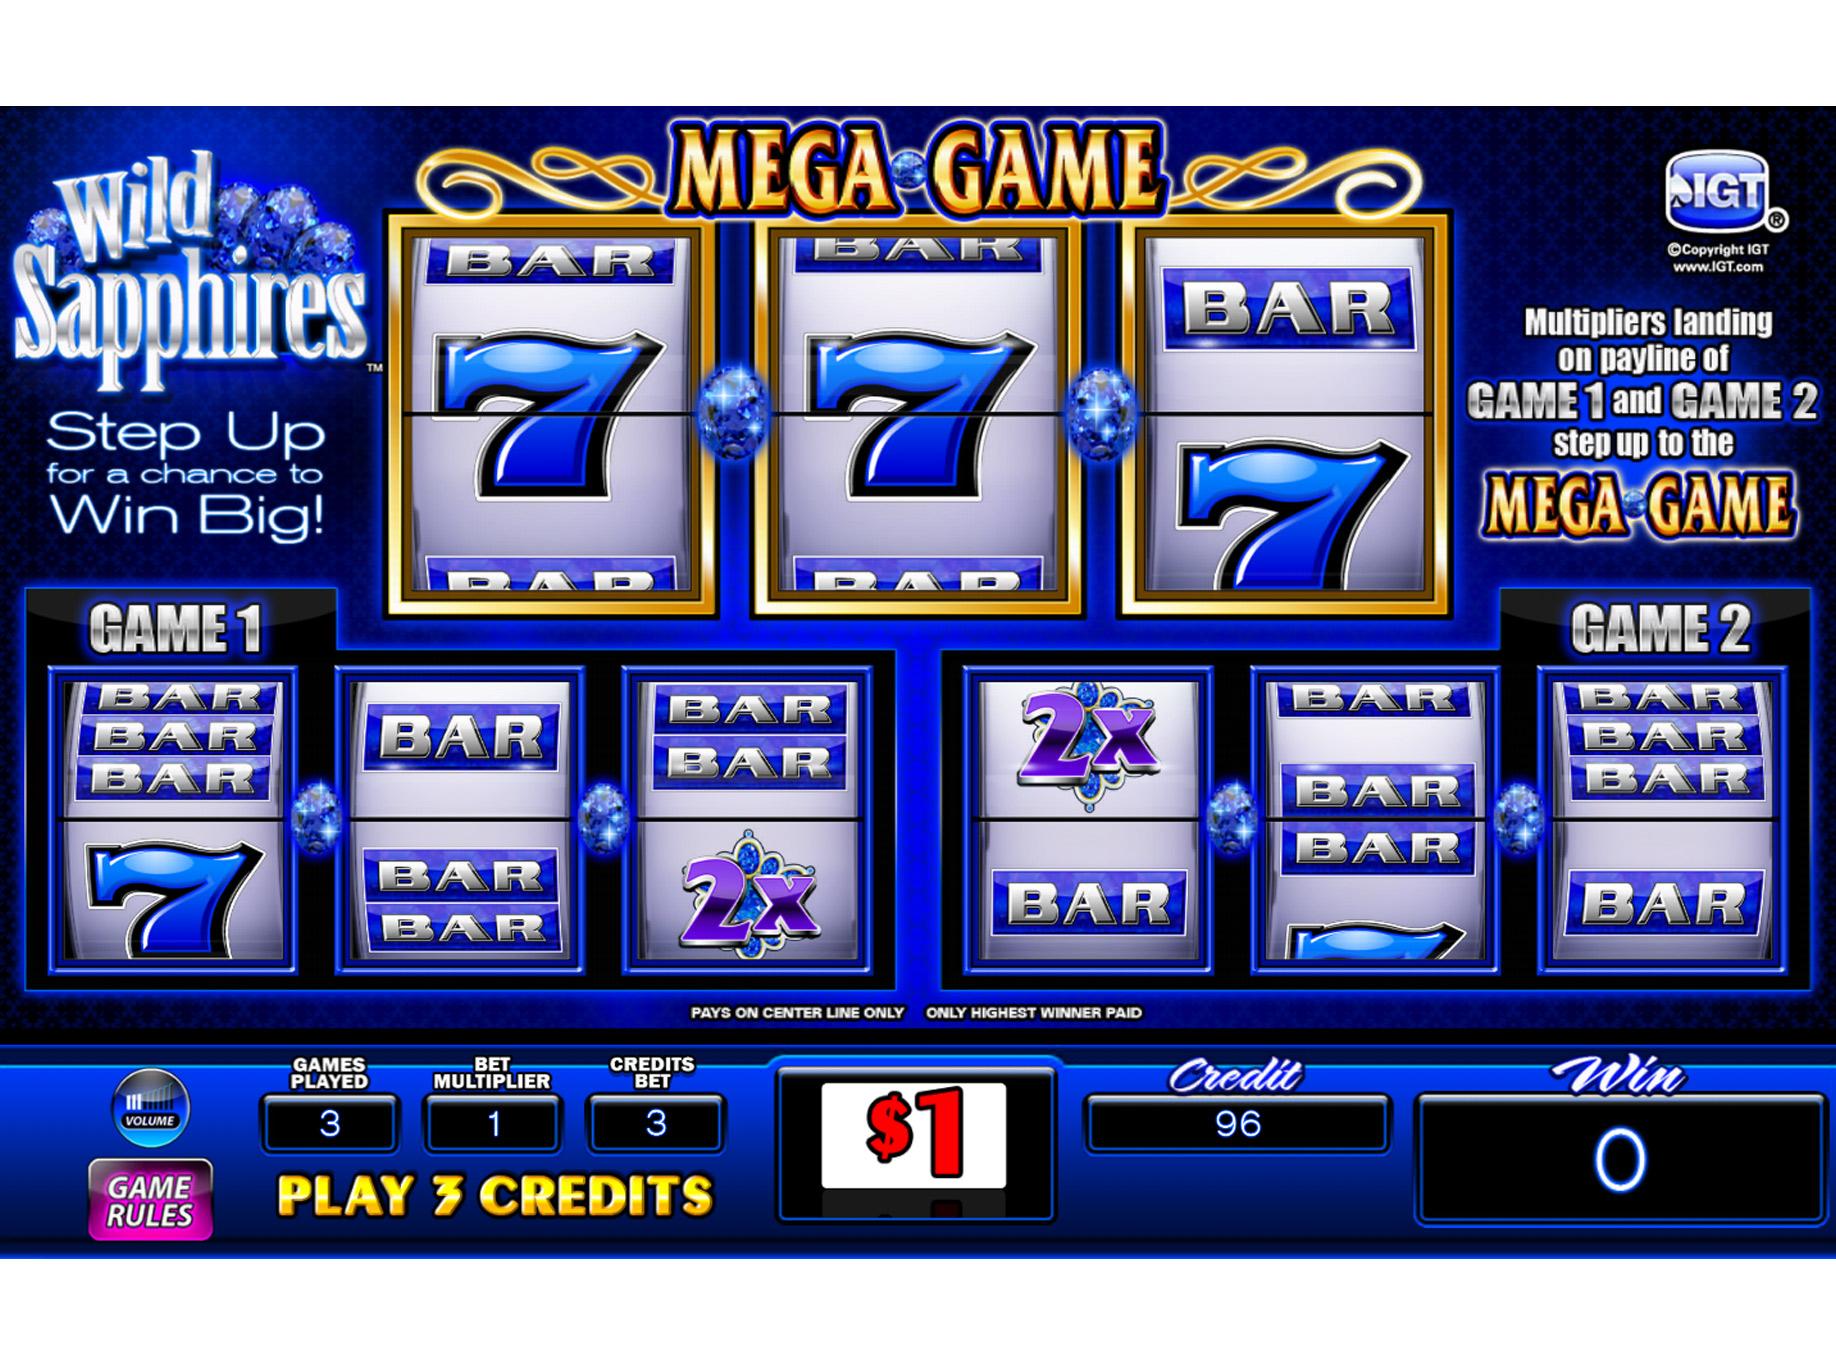 IGT slot machine.